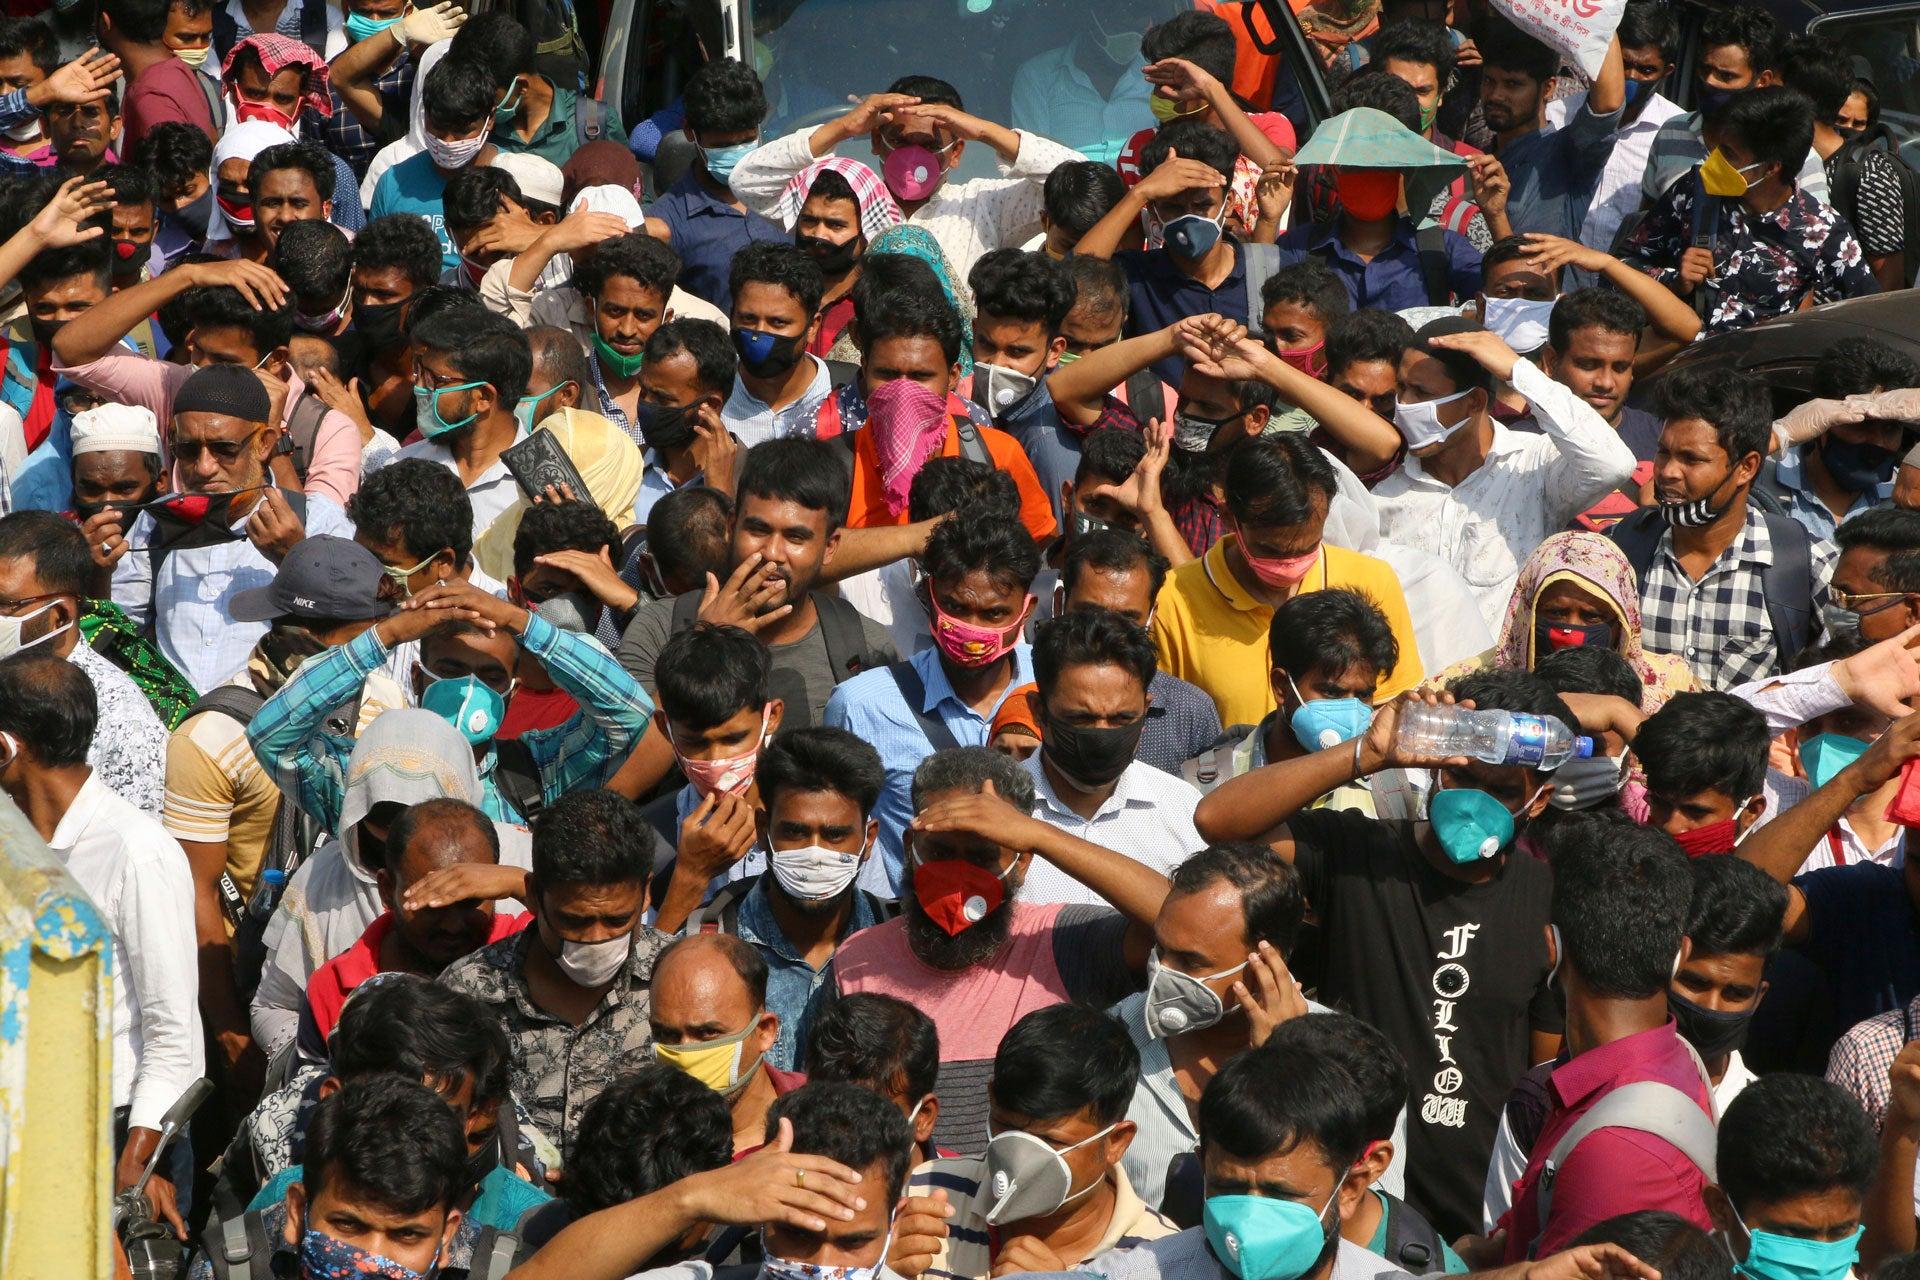 https://www.hrw.org/sites/default/files/multimedia_images_2020/202004asia_bangladesh_labor_coronavirus.jpg